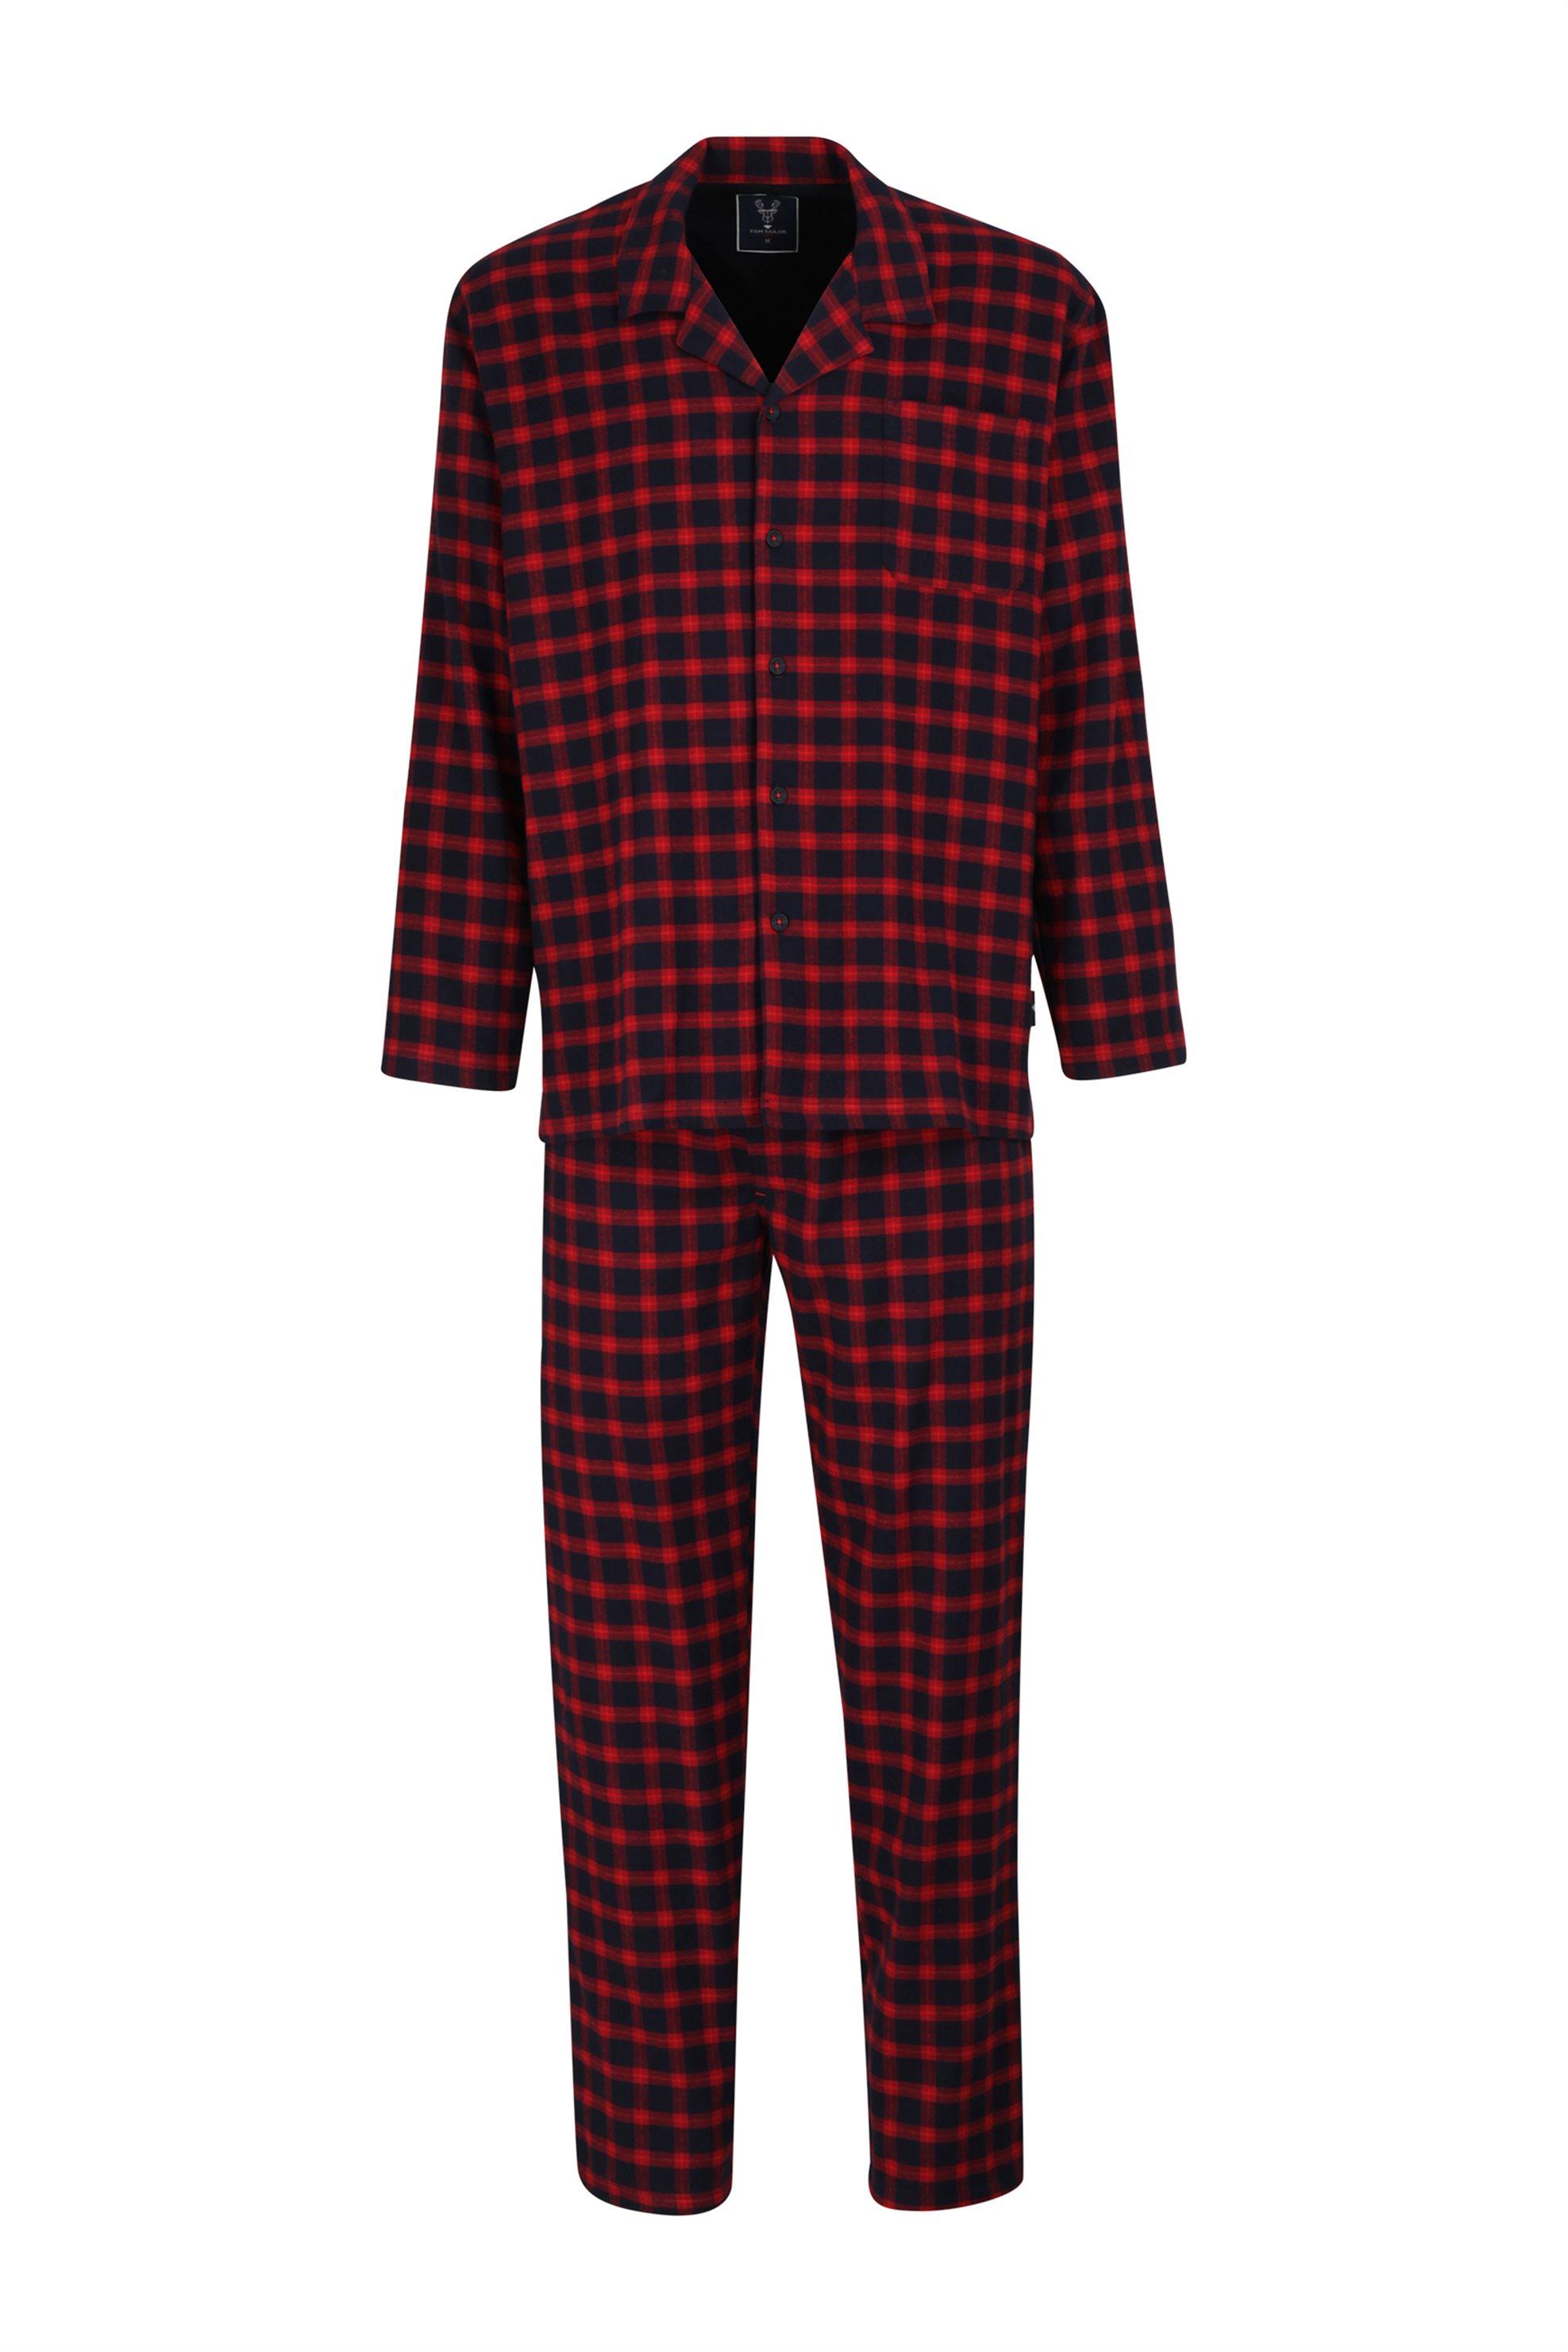 Tom Tailor ανδρική καρό πιτζάμα με τσέπη στο στήθος - 71173-48/56 - Κόκκινο